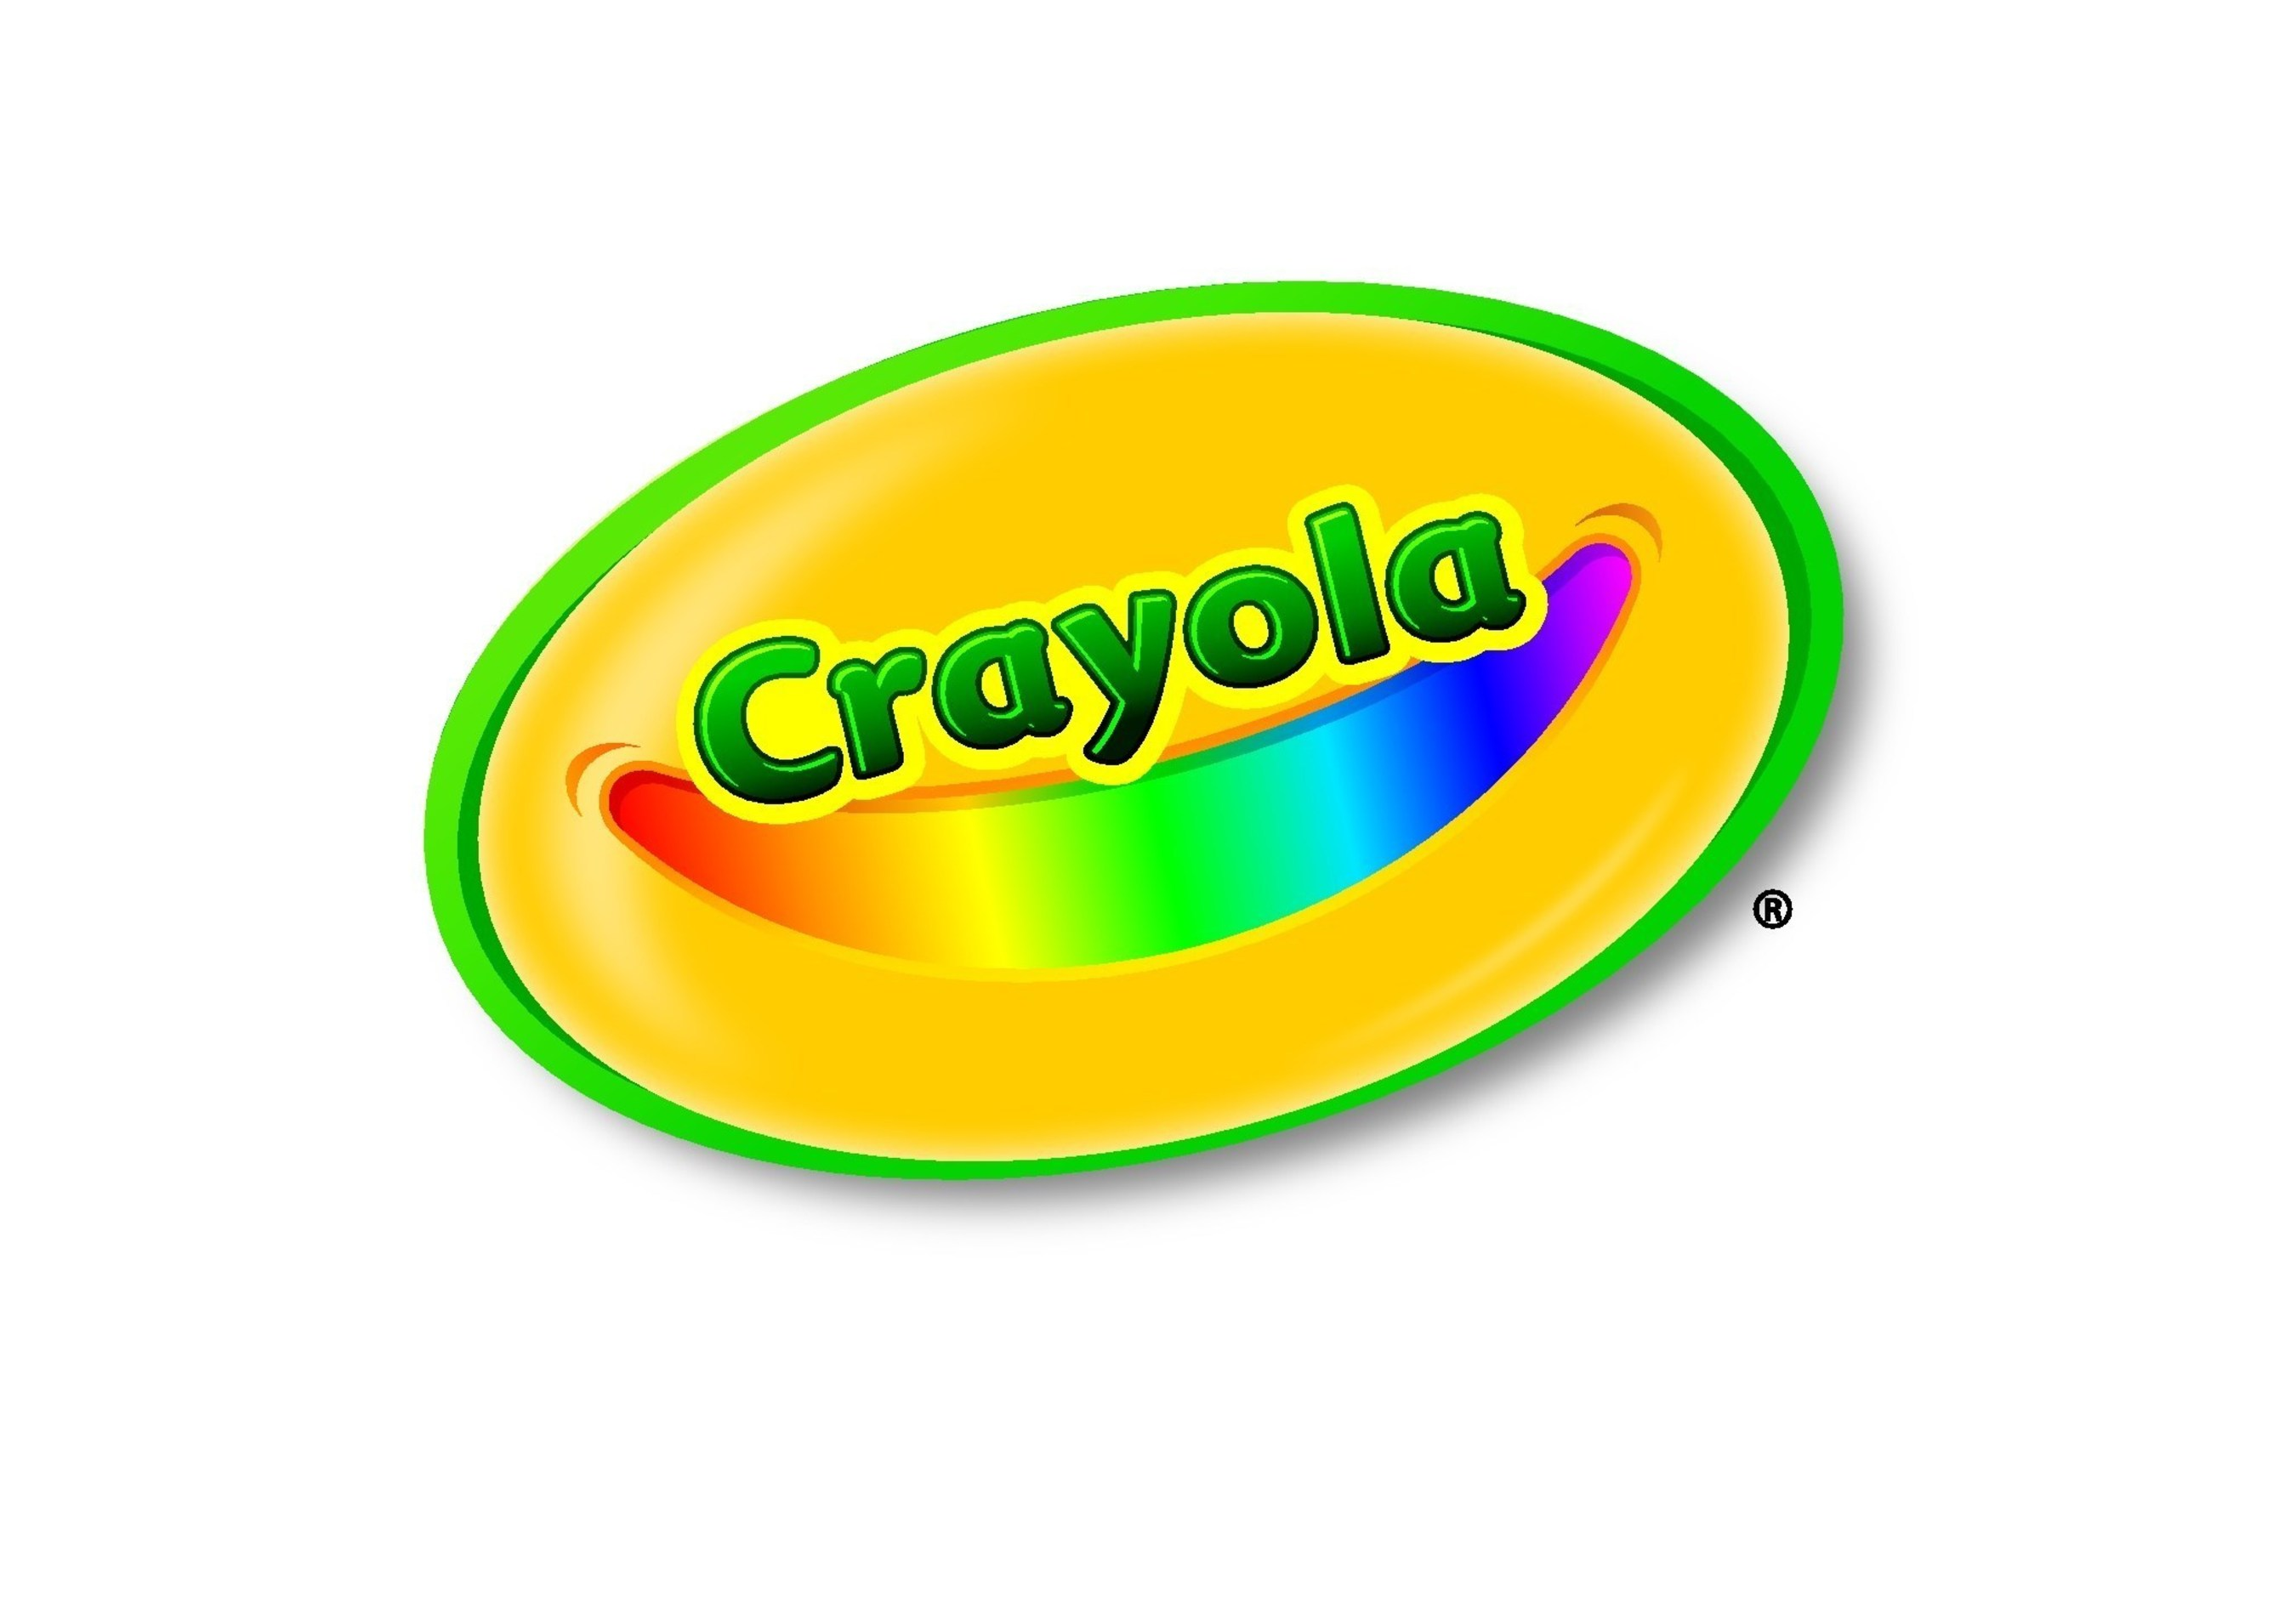 https://www.anrdoezrs.net/links/8891574/type/dlg/https://www.crayola.com/